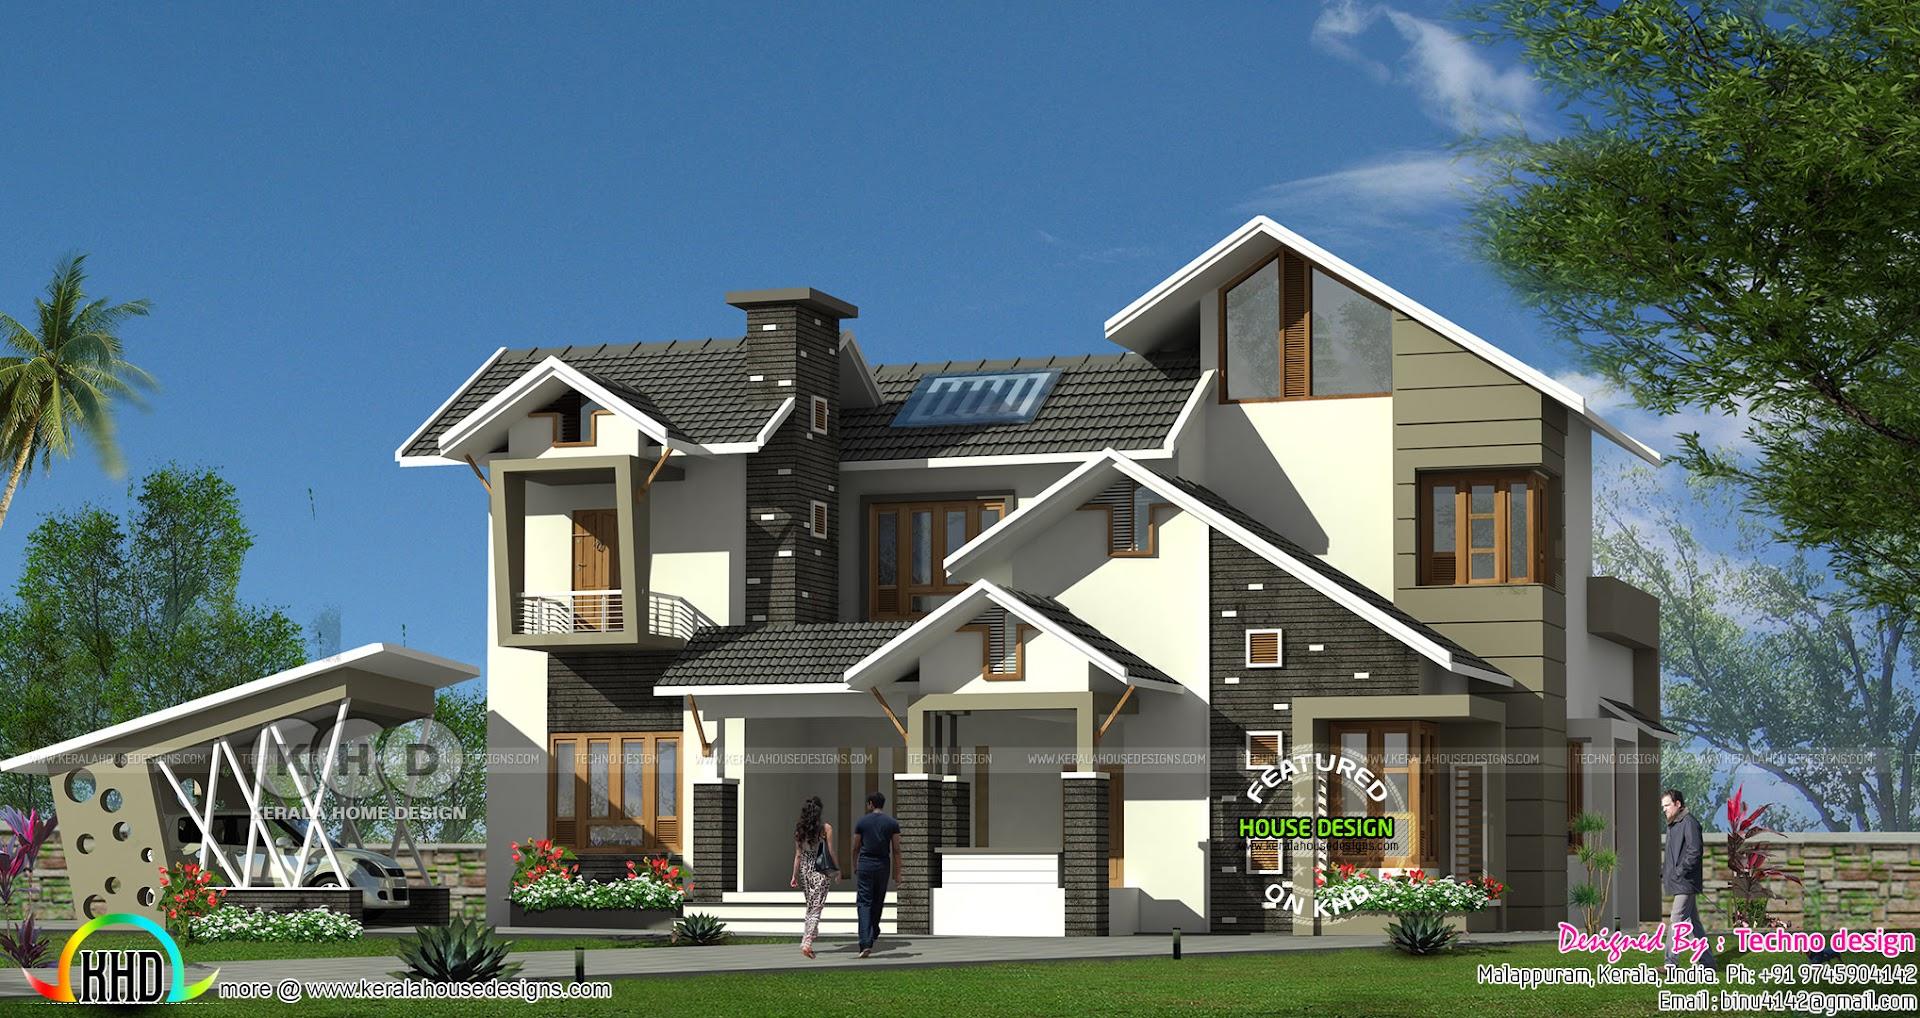 K H D Home Design Part - 43: Ultra Modern 4 Bedroom Sloping Roof Kerala Home